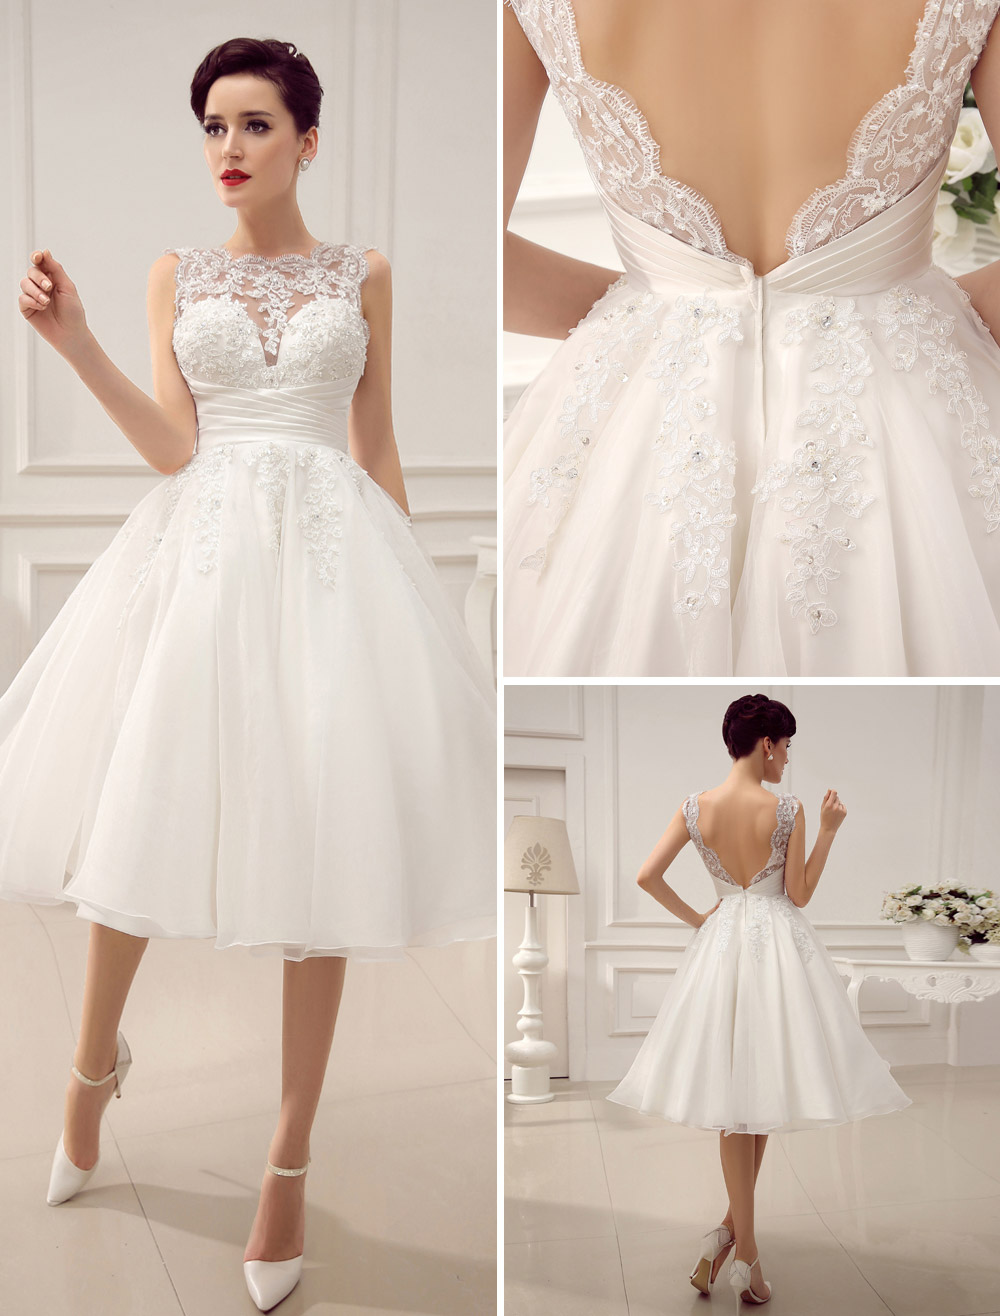 Wedding Dresses 2015Cheap Wedding Dresses Discount Bridal Gowns